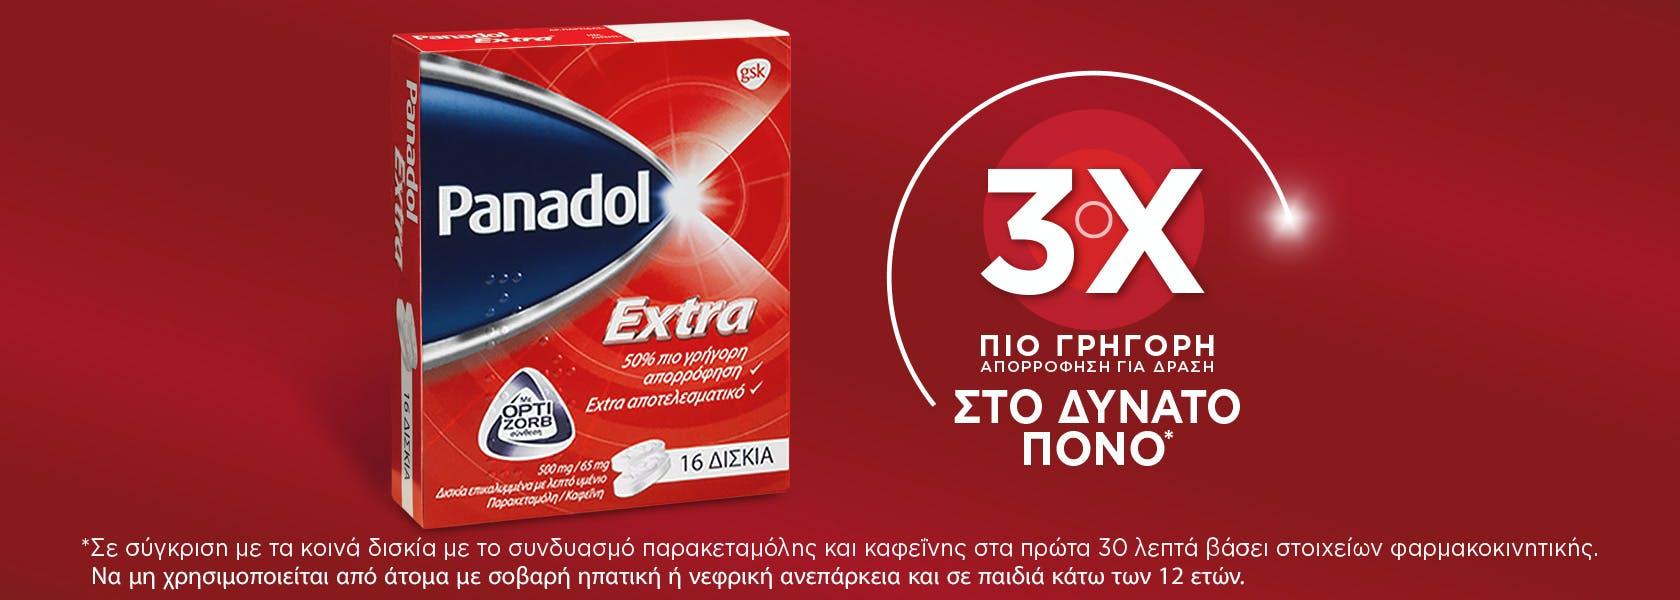 Panadol Cold & Flu